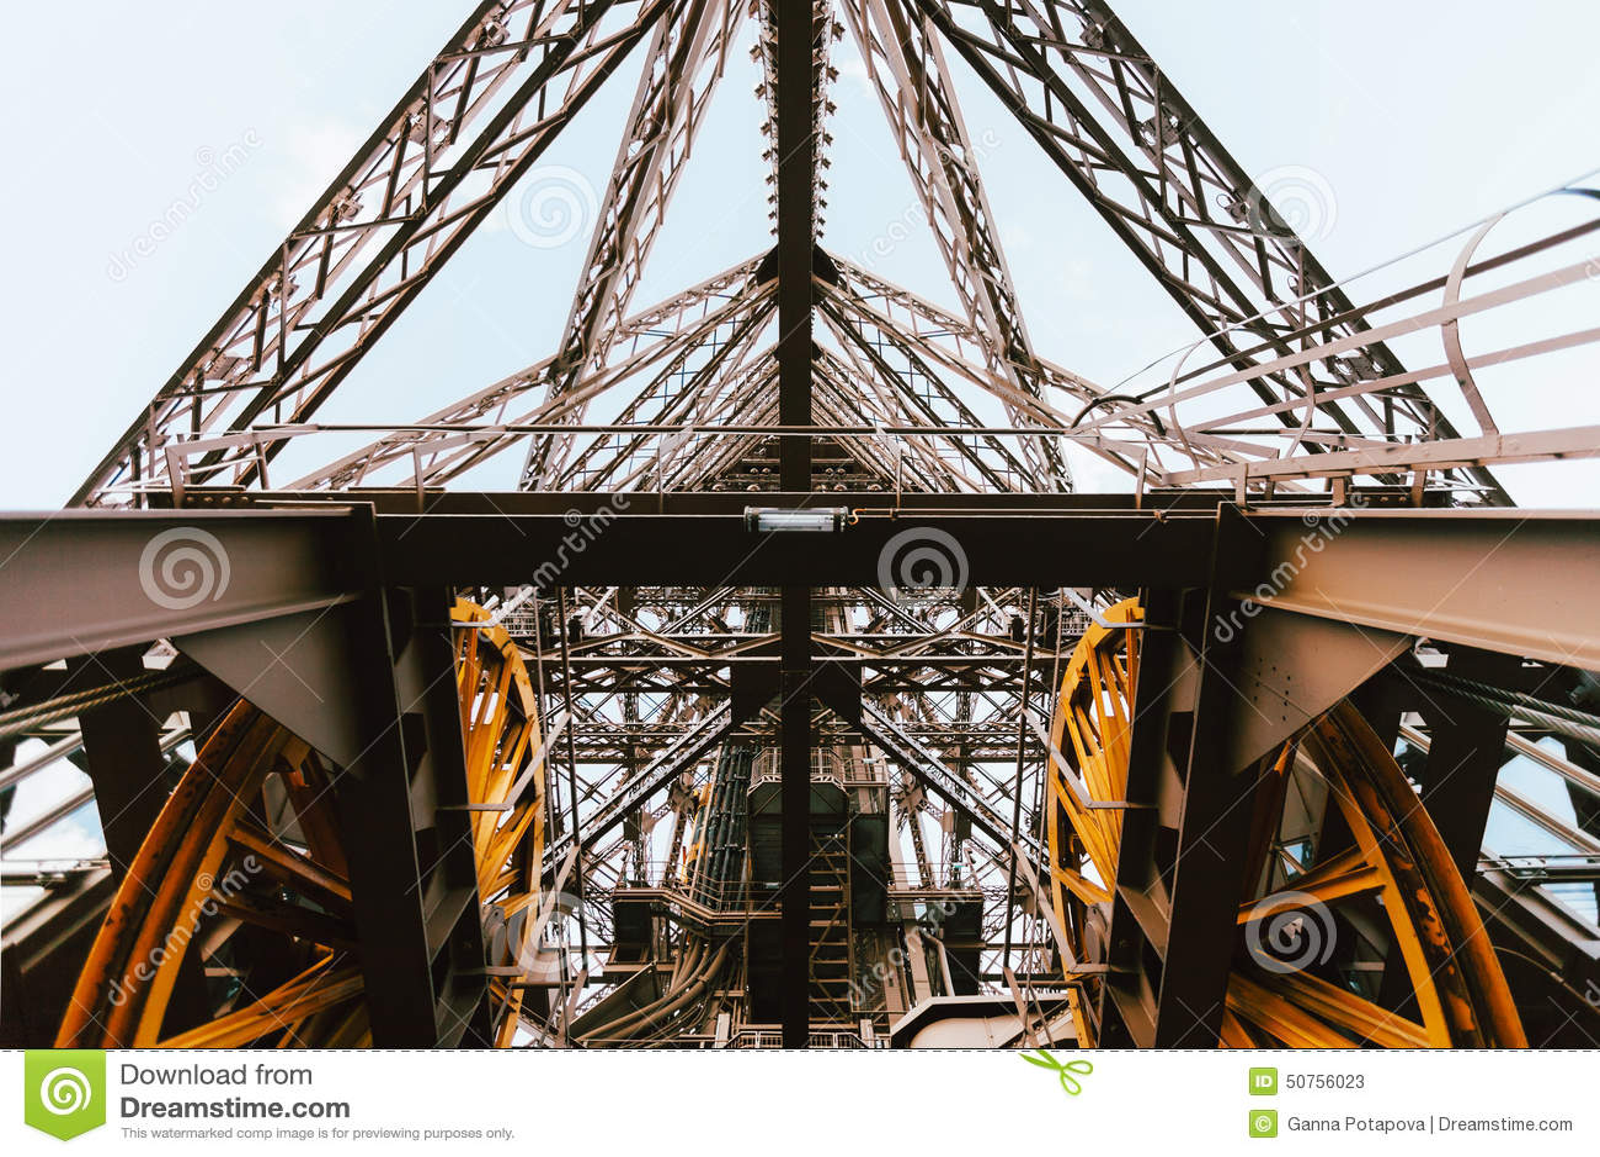 eiffel tower elevator mechanism paris france stock photo. Black Bedroom Furniture Sets. Home Design Ideas